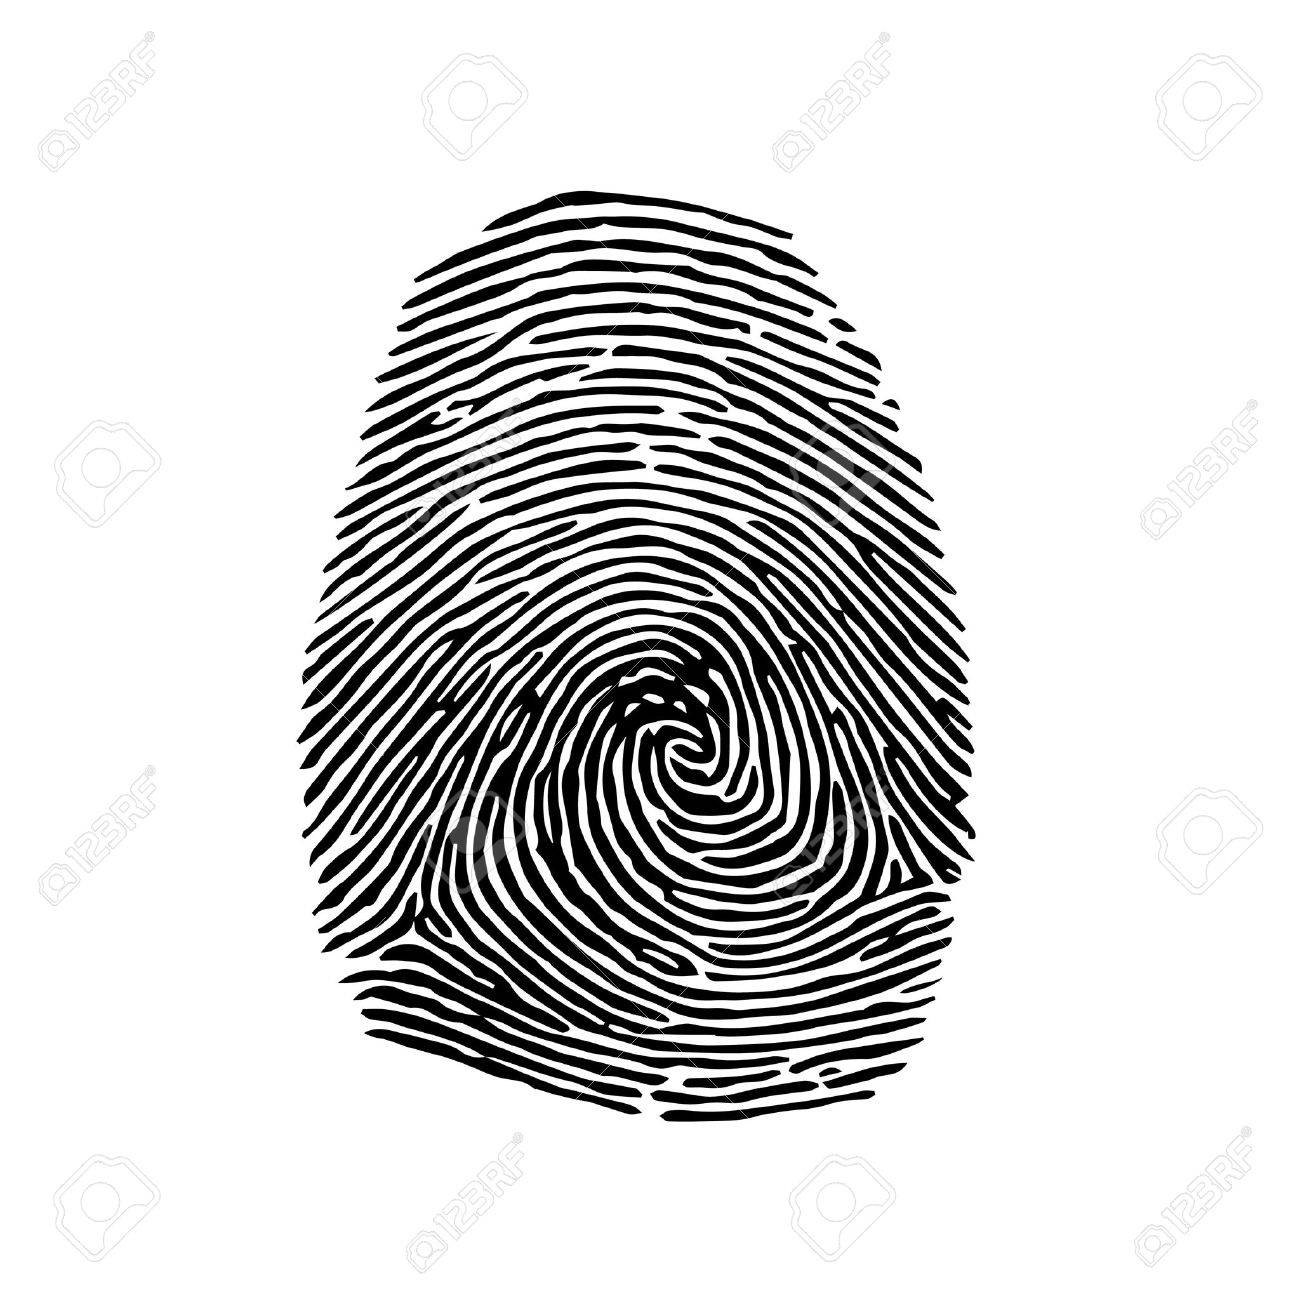 fingerprint vector royalty free cliparts vectors and stock rh 123rf com fingerprinting victorville fingerprinting victoria